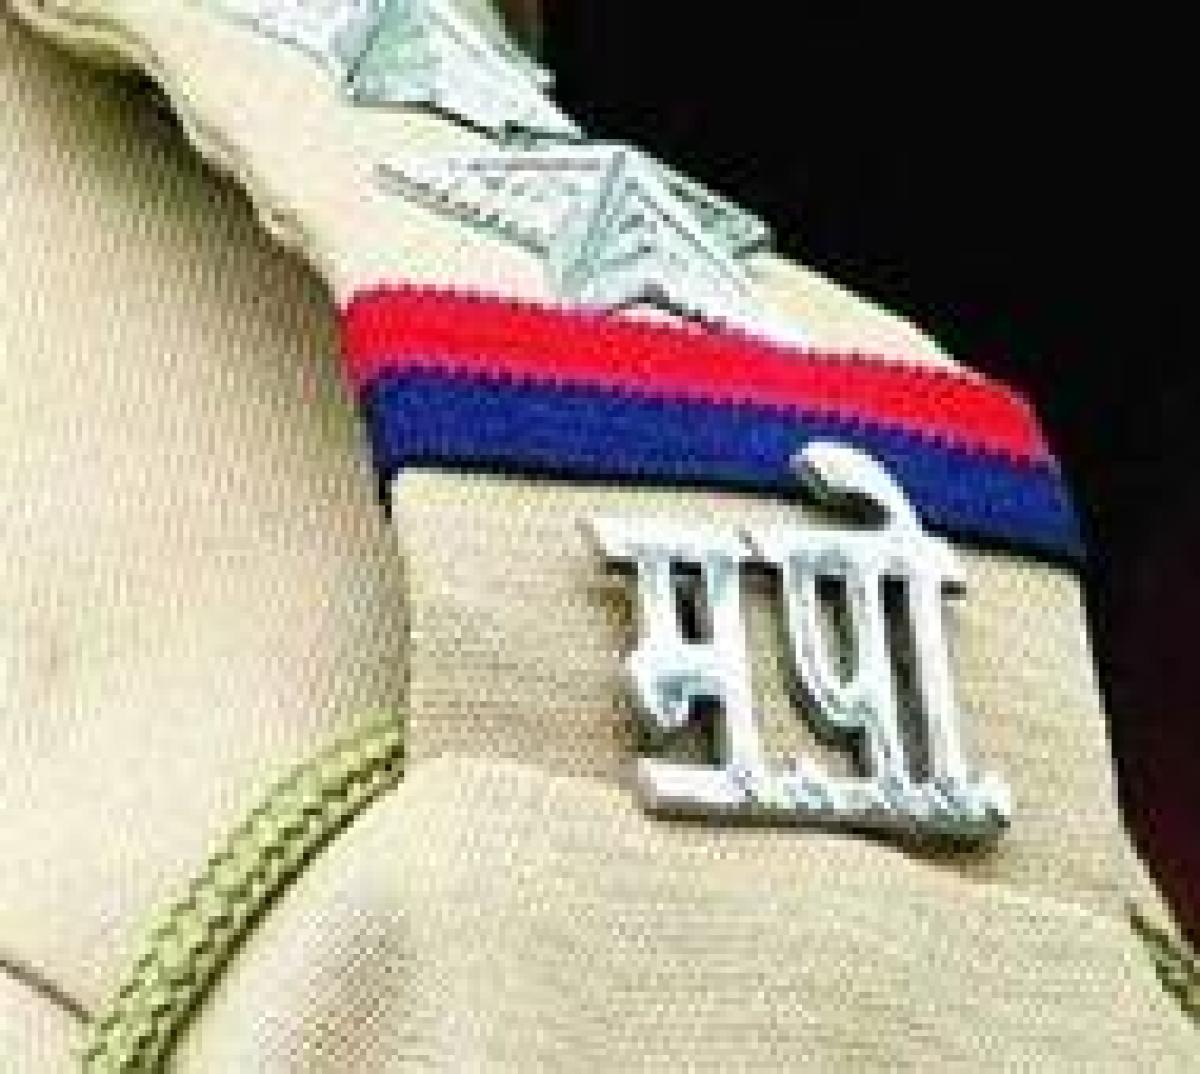 Maha cops to get cheaper medicines, discounted medical tests